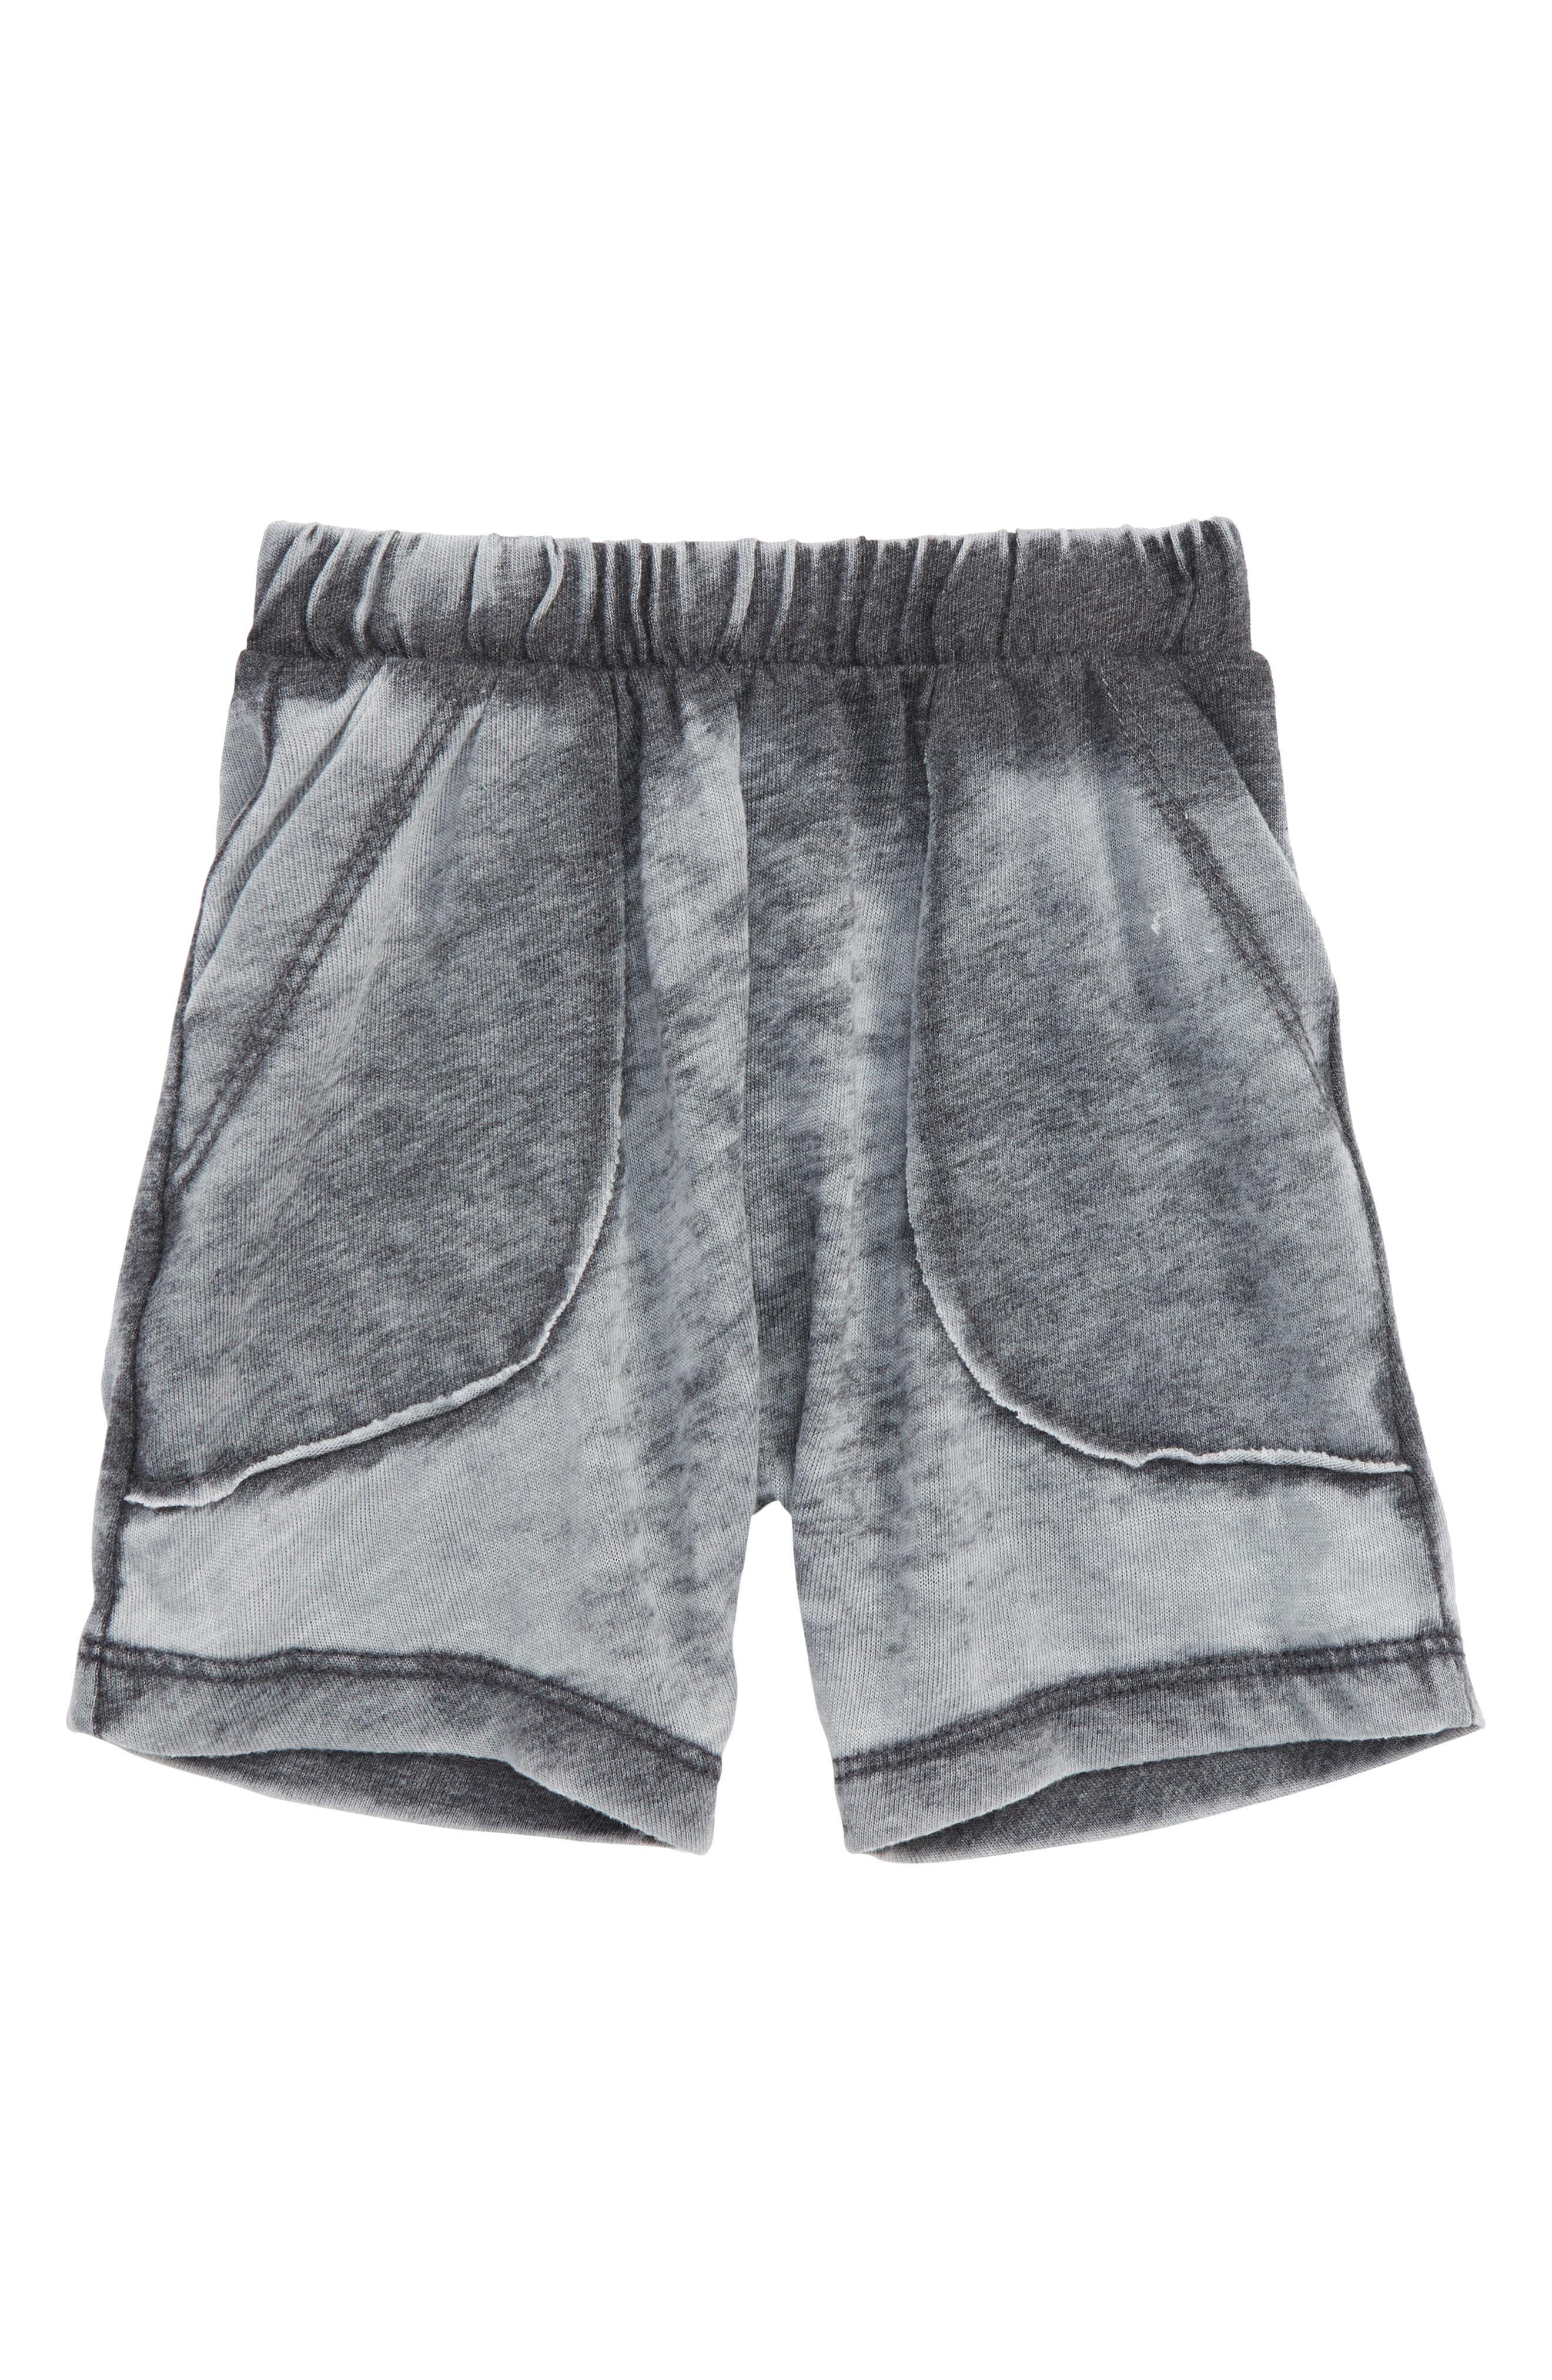 JOAH LOVE Knit Shorts, Main, color, 020